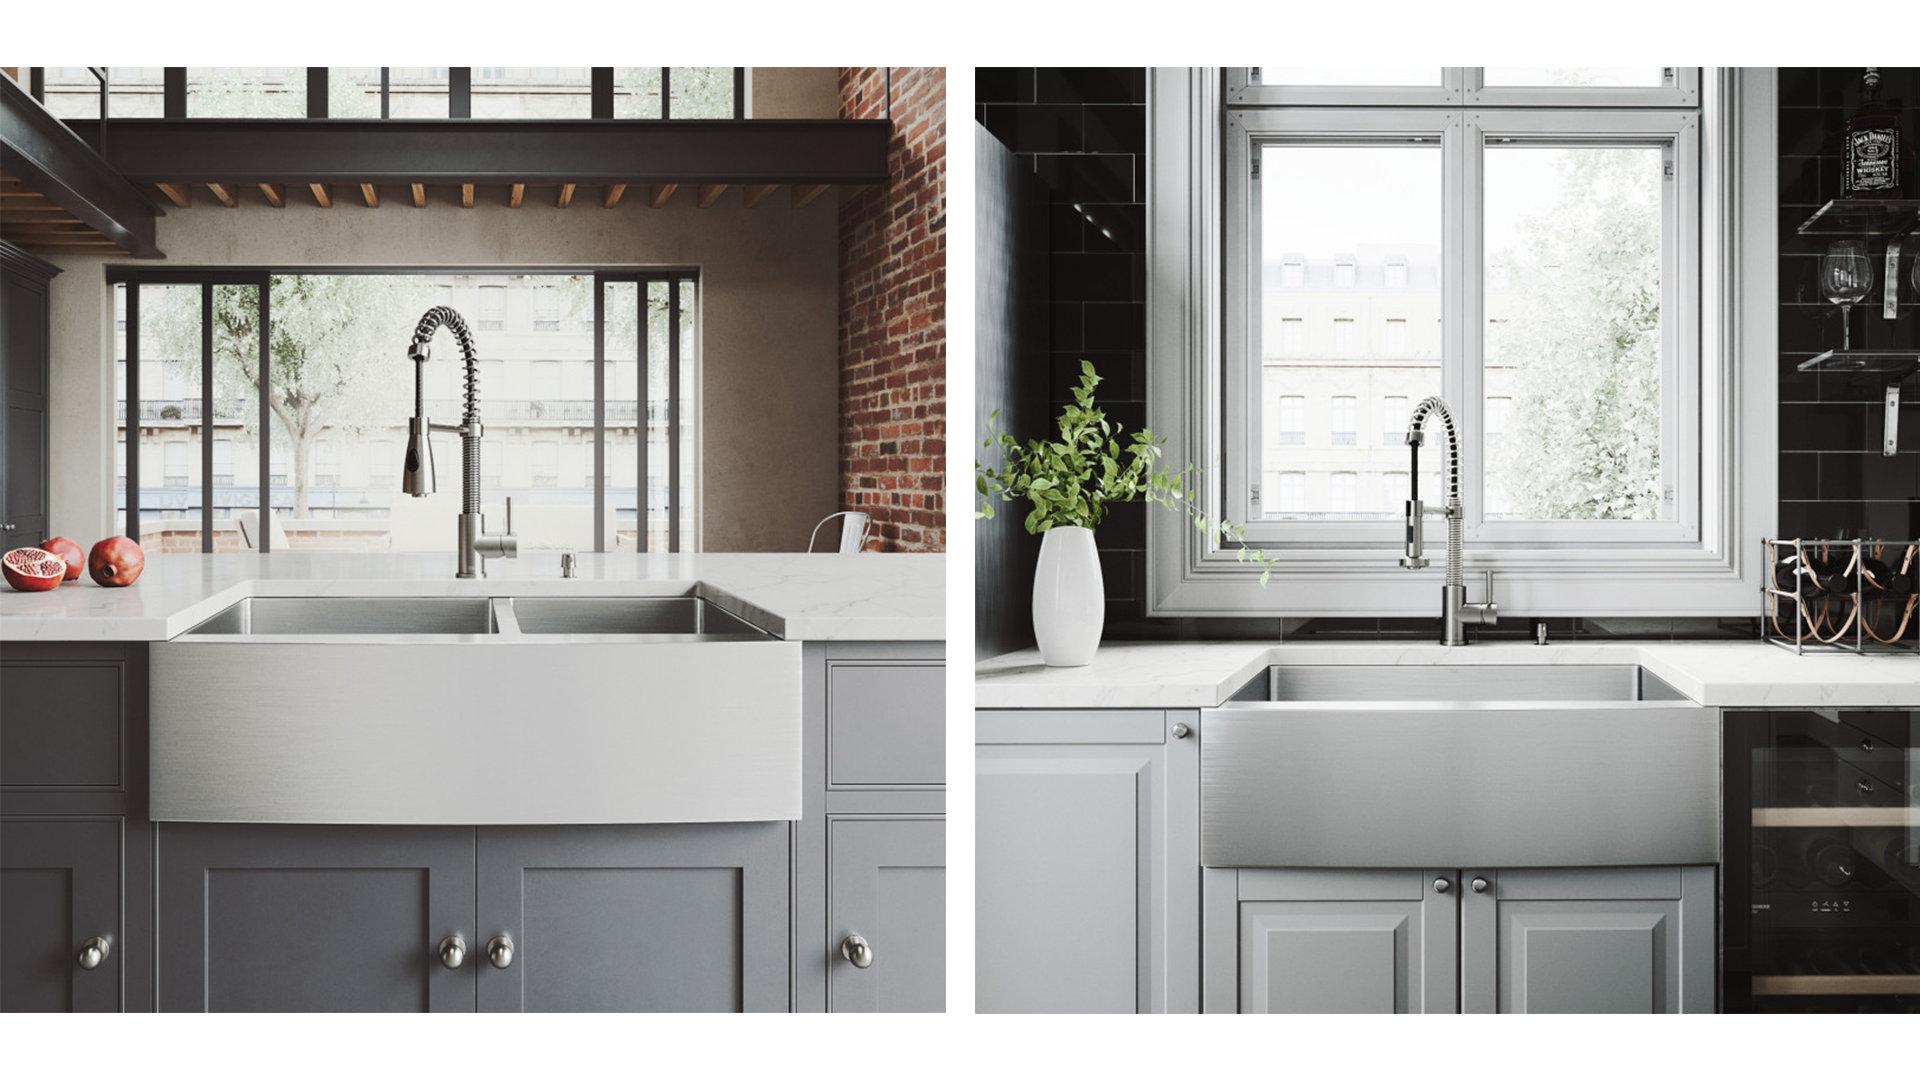 Two VIGO Stainless Steel Farmhouse Kitchen Sinks, one double bowl model and one single bowl model